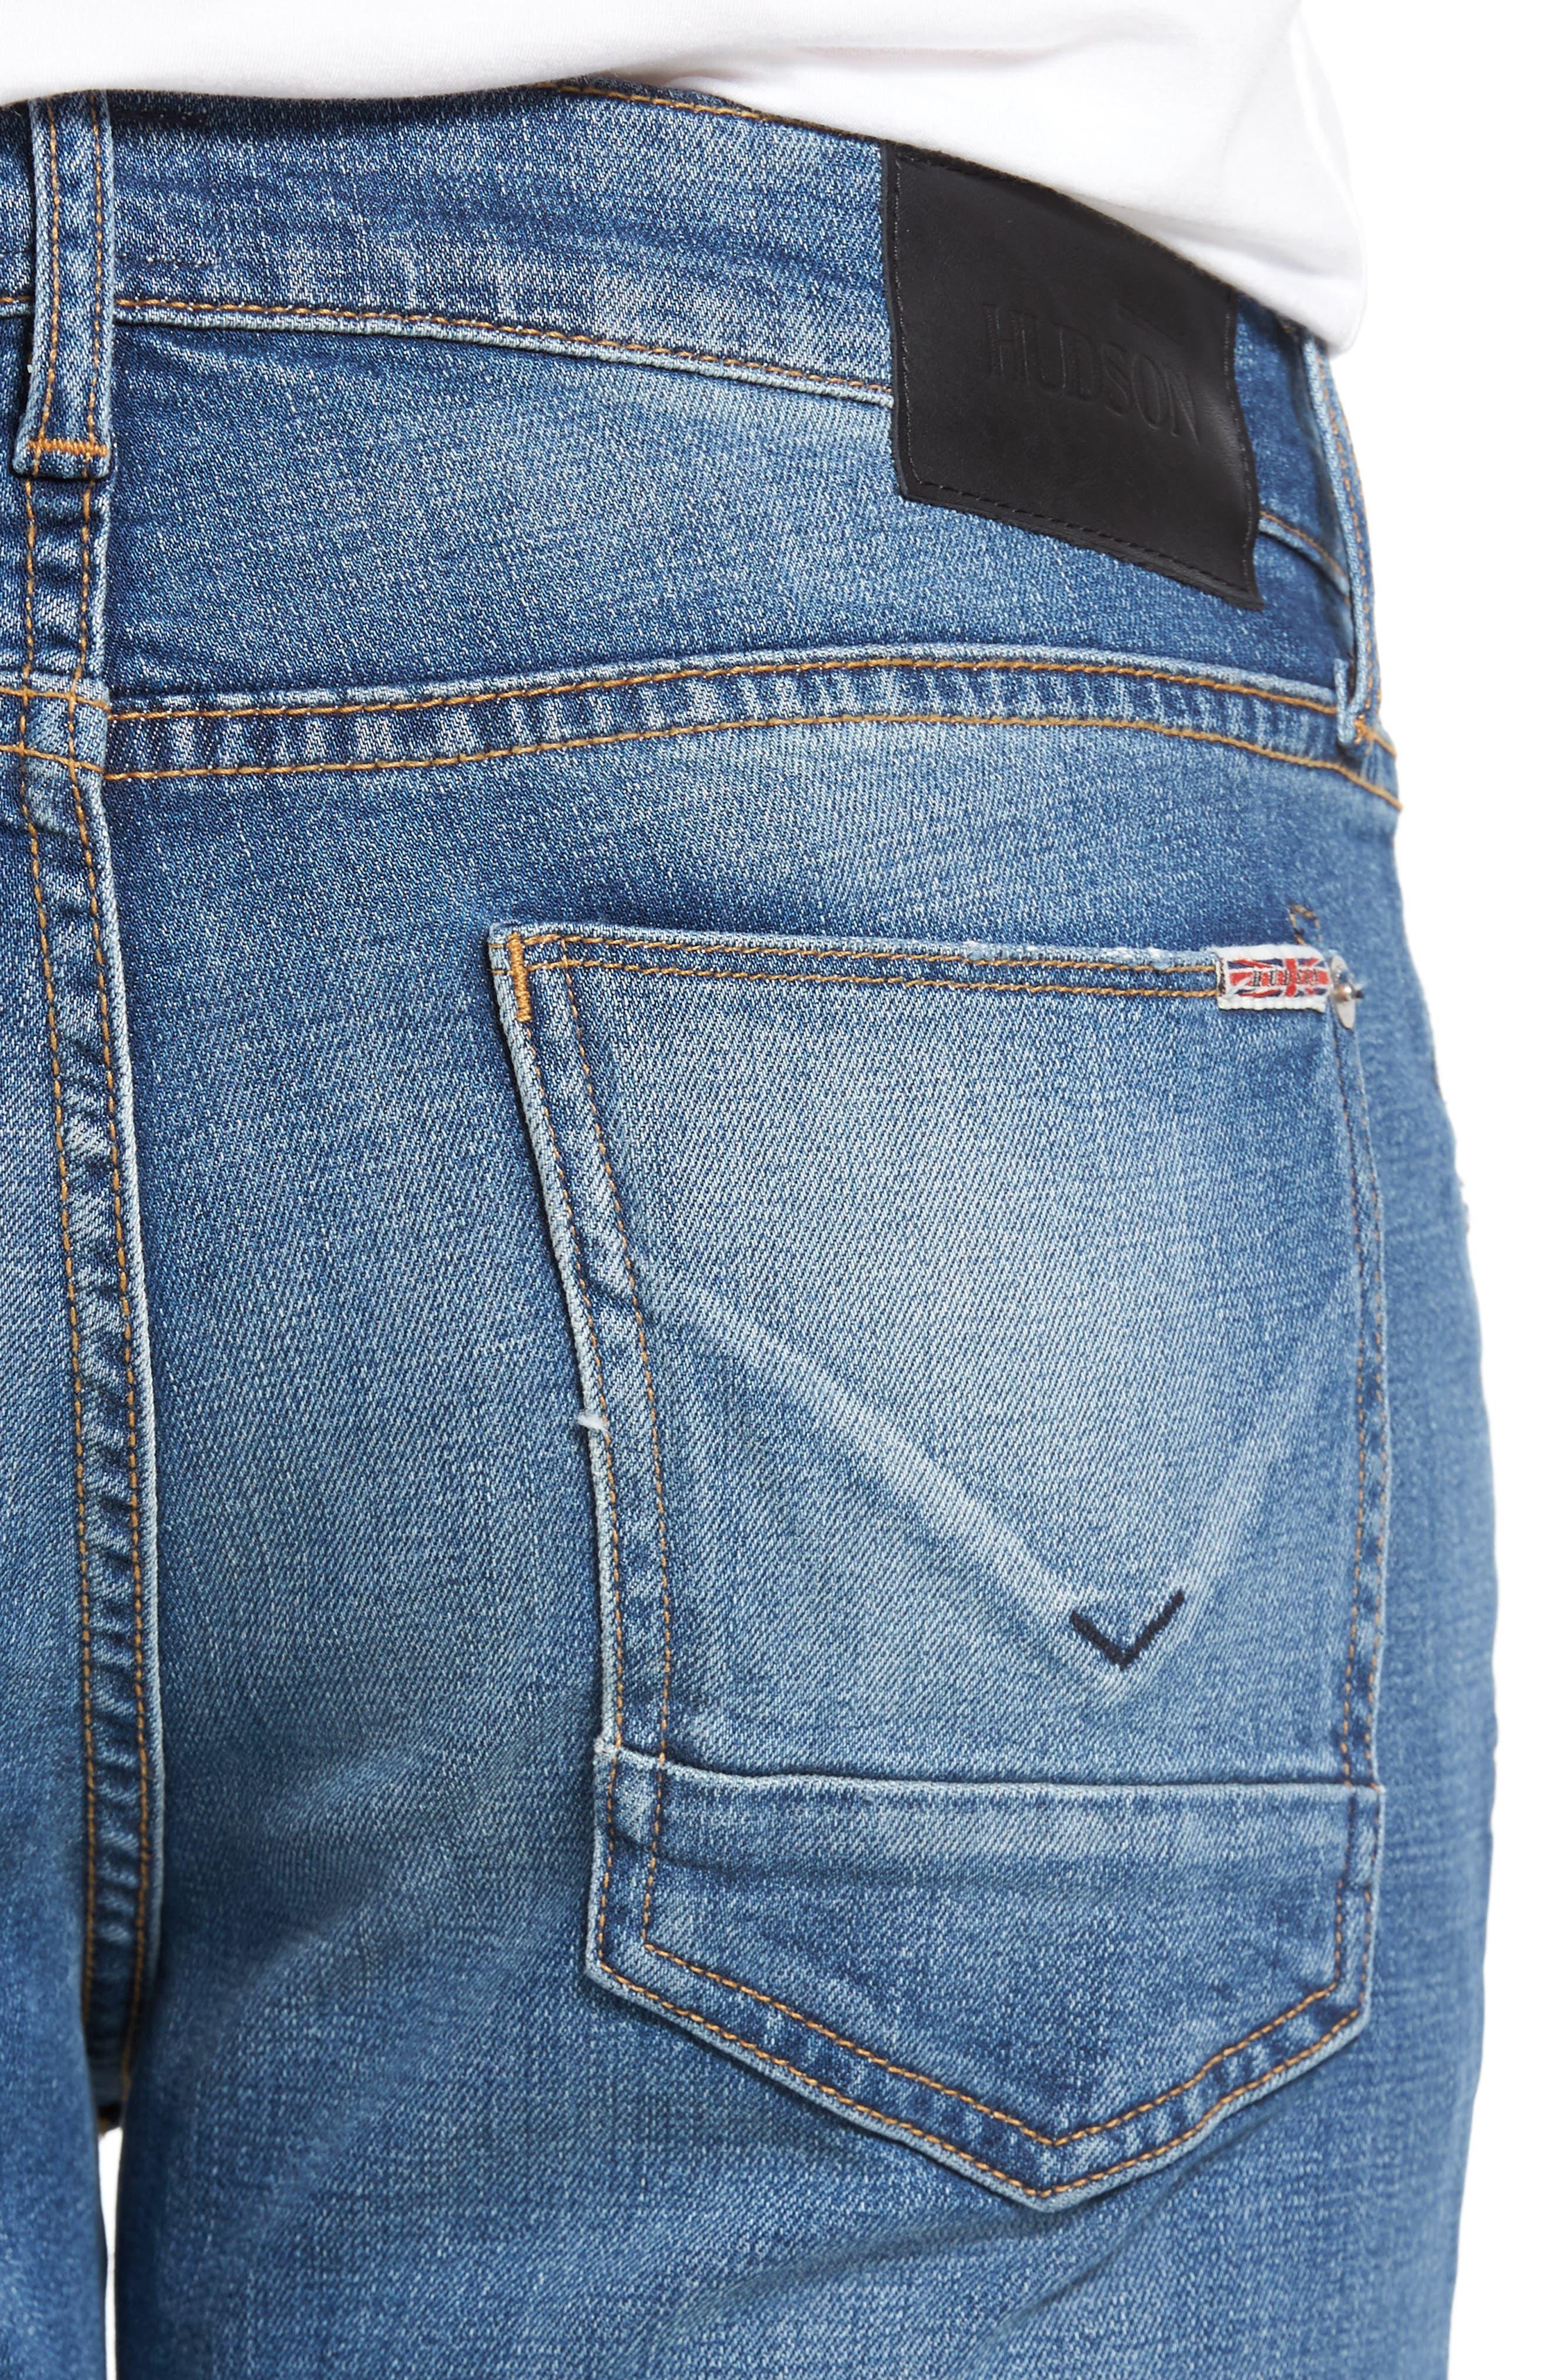 Byron Slim Straight Leg Jeans,                             Alternate thumbnail 4, color,                             453